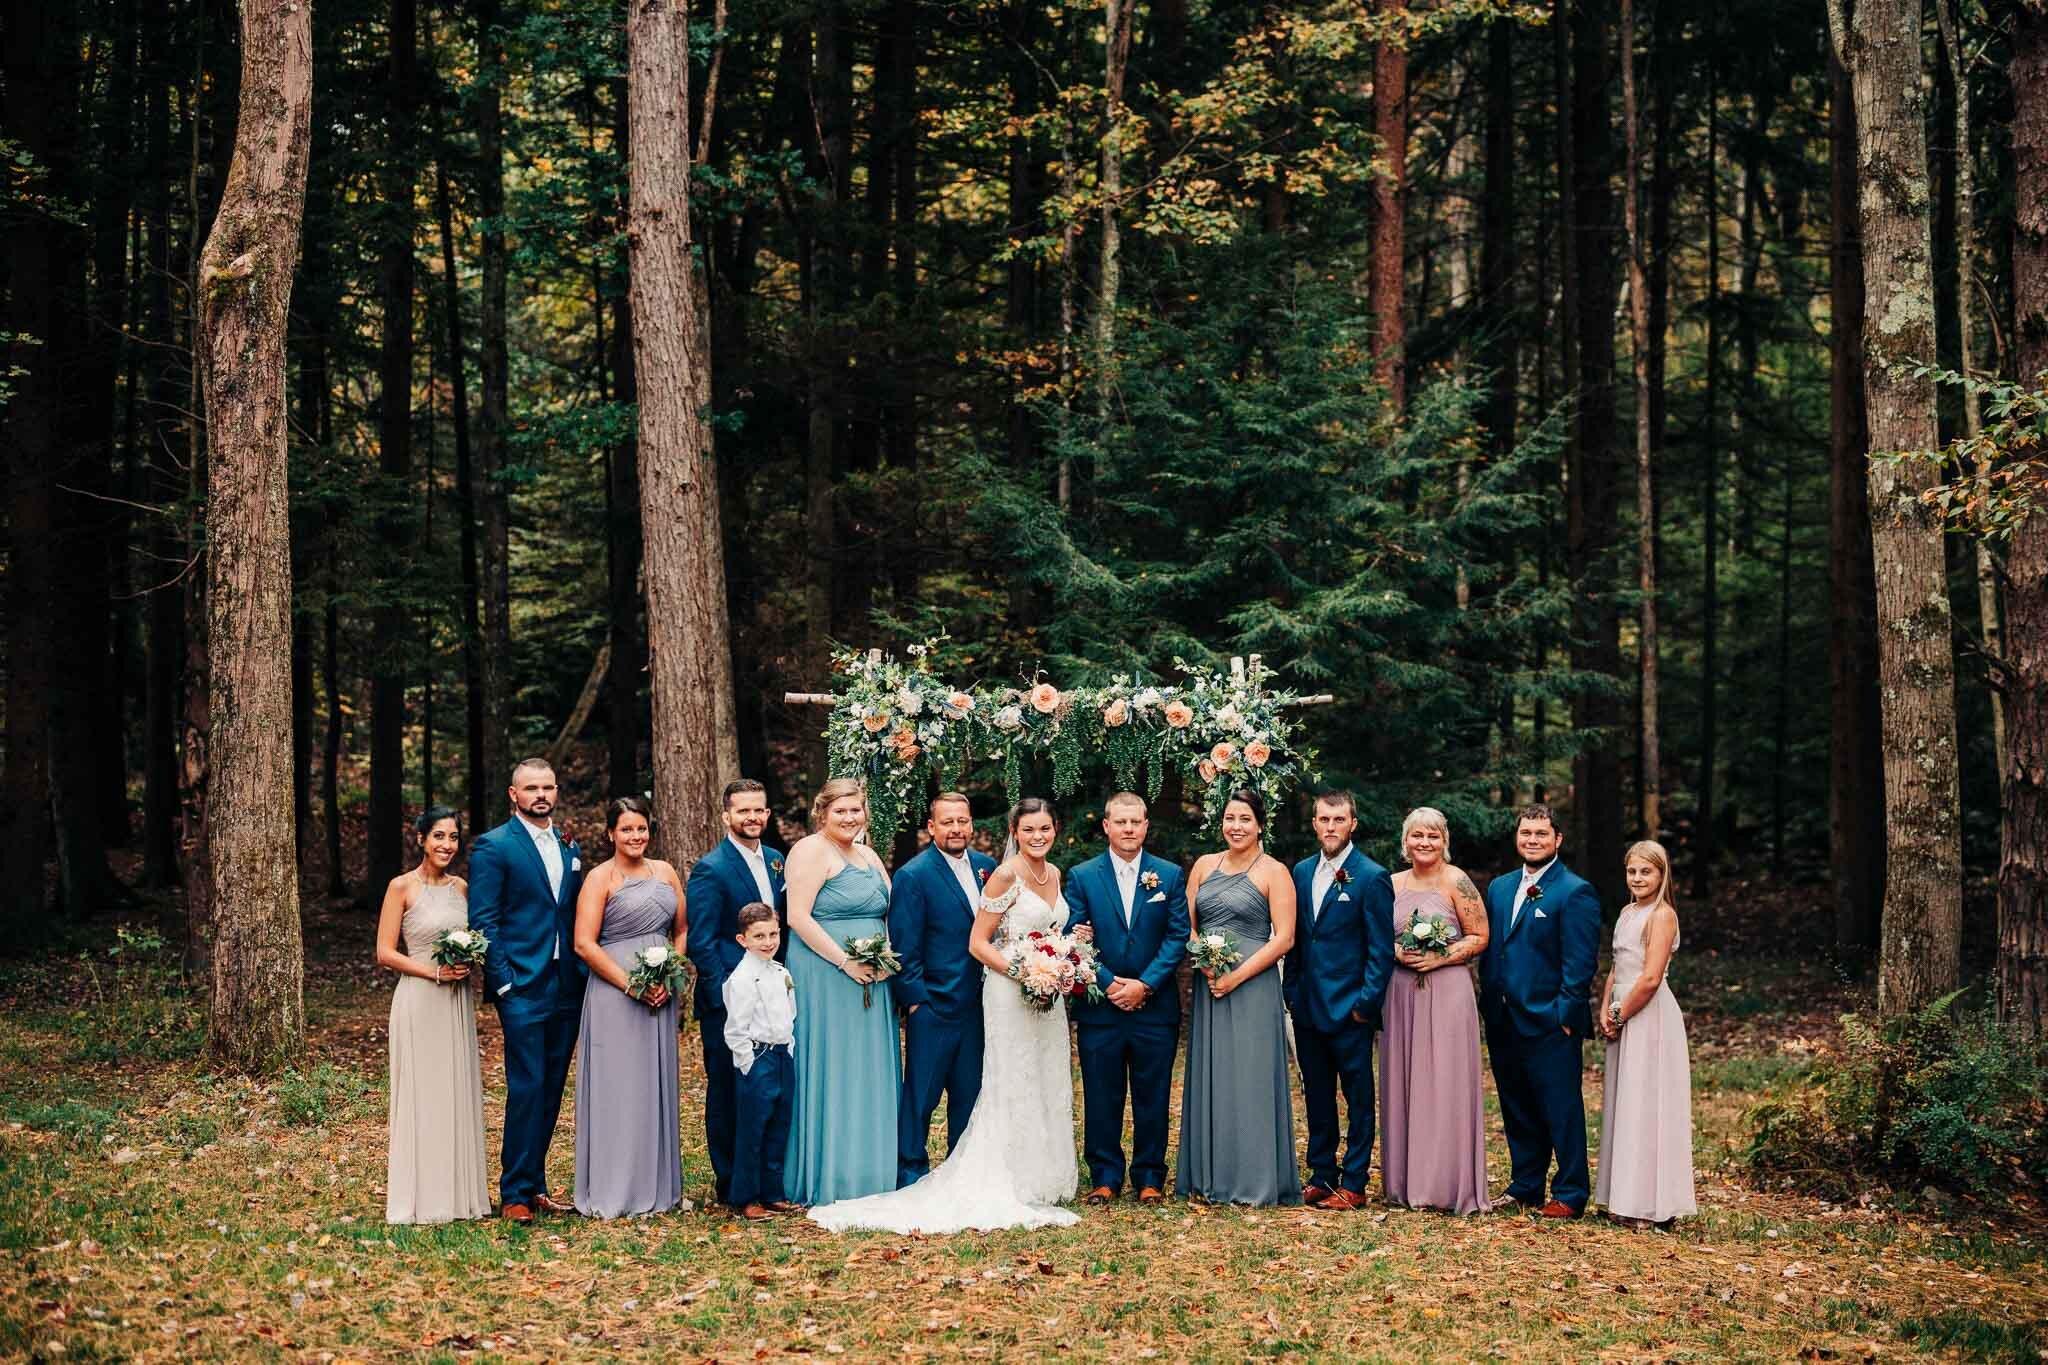 whitewoods-fall-wedding-8108.jpg